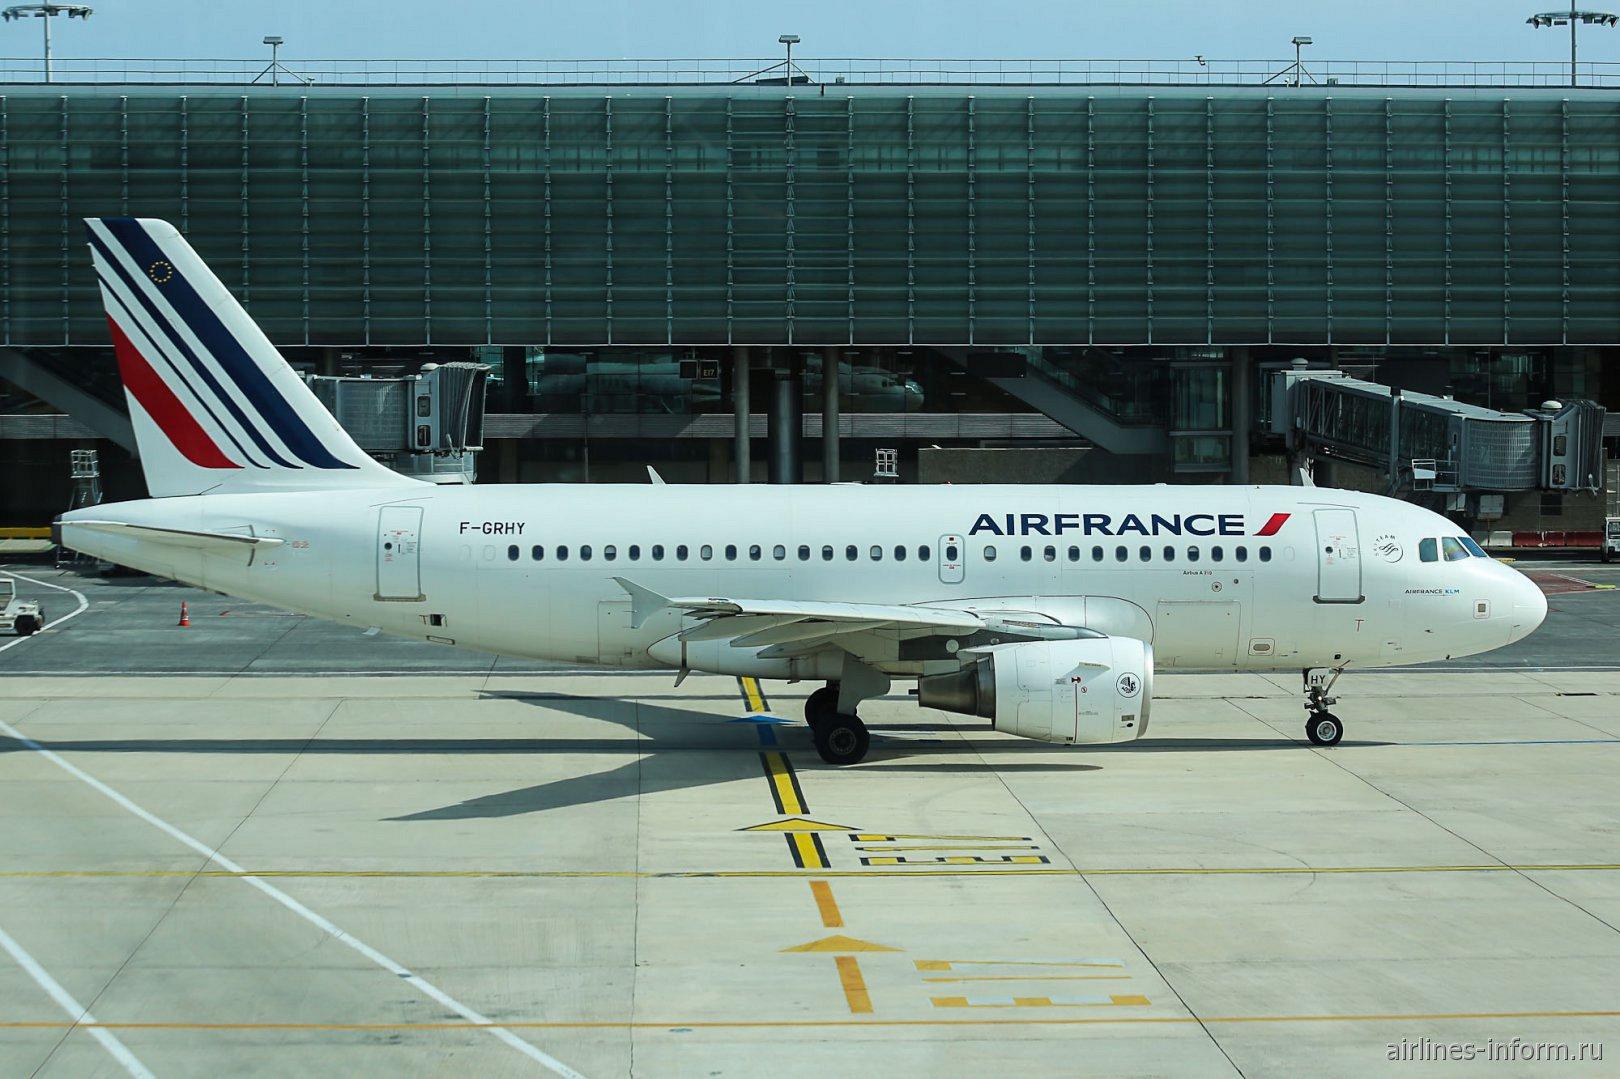 Airbus A319 F-GRHY авиакомпании Air France в аэропорту Париж Шарль-де-Голль